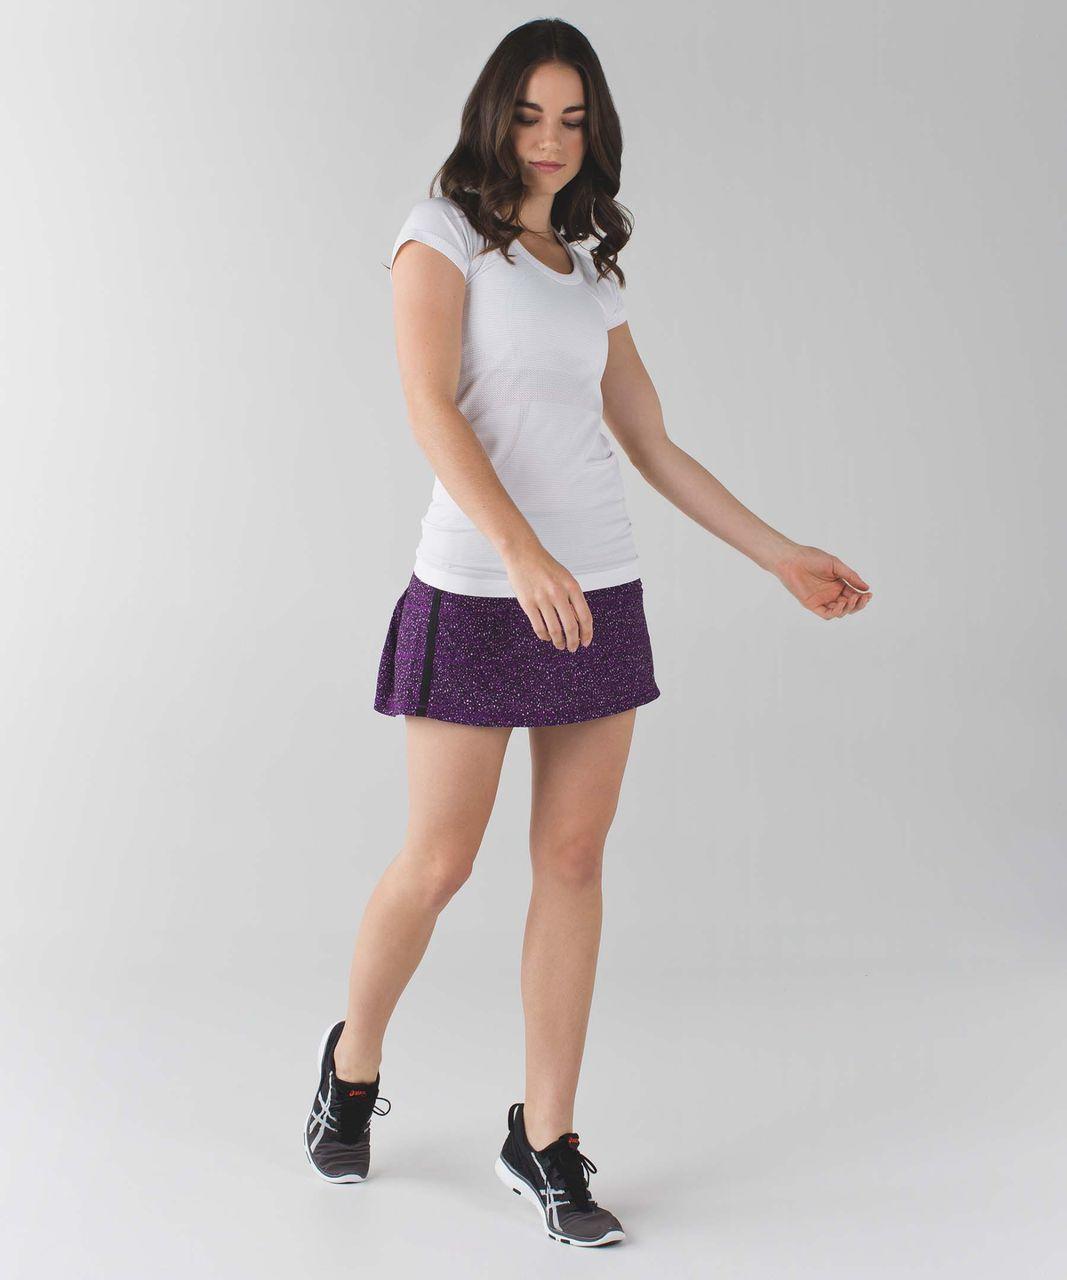 Lululemon Pace Rival Skirt II (Regular) *4-way Stretch - Flashback Static Powdered Rose Tender Violet / Black